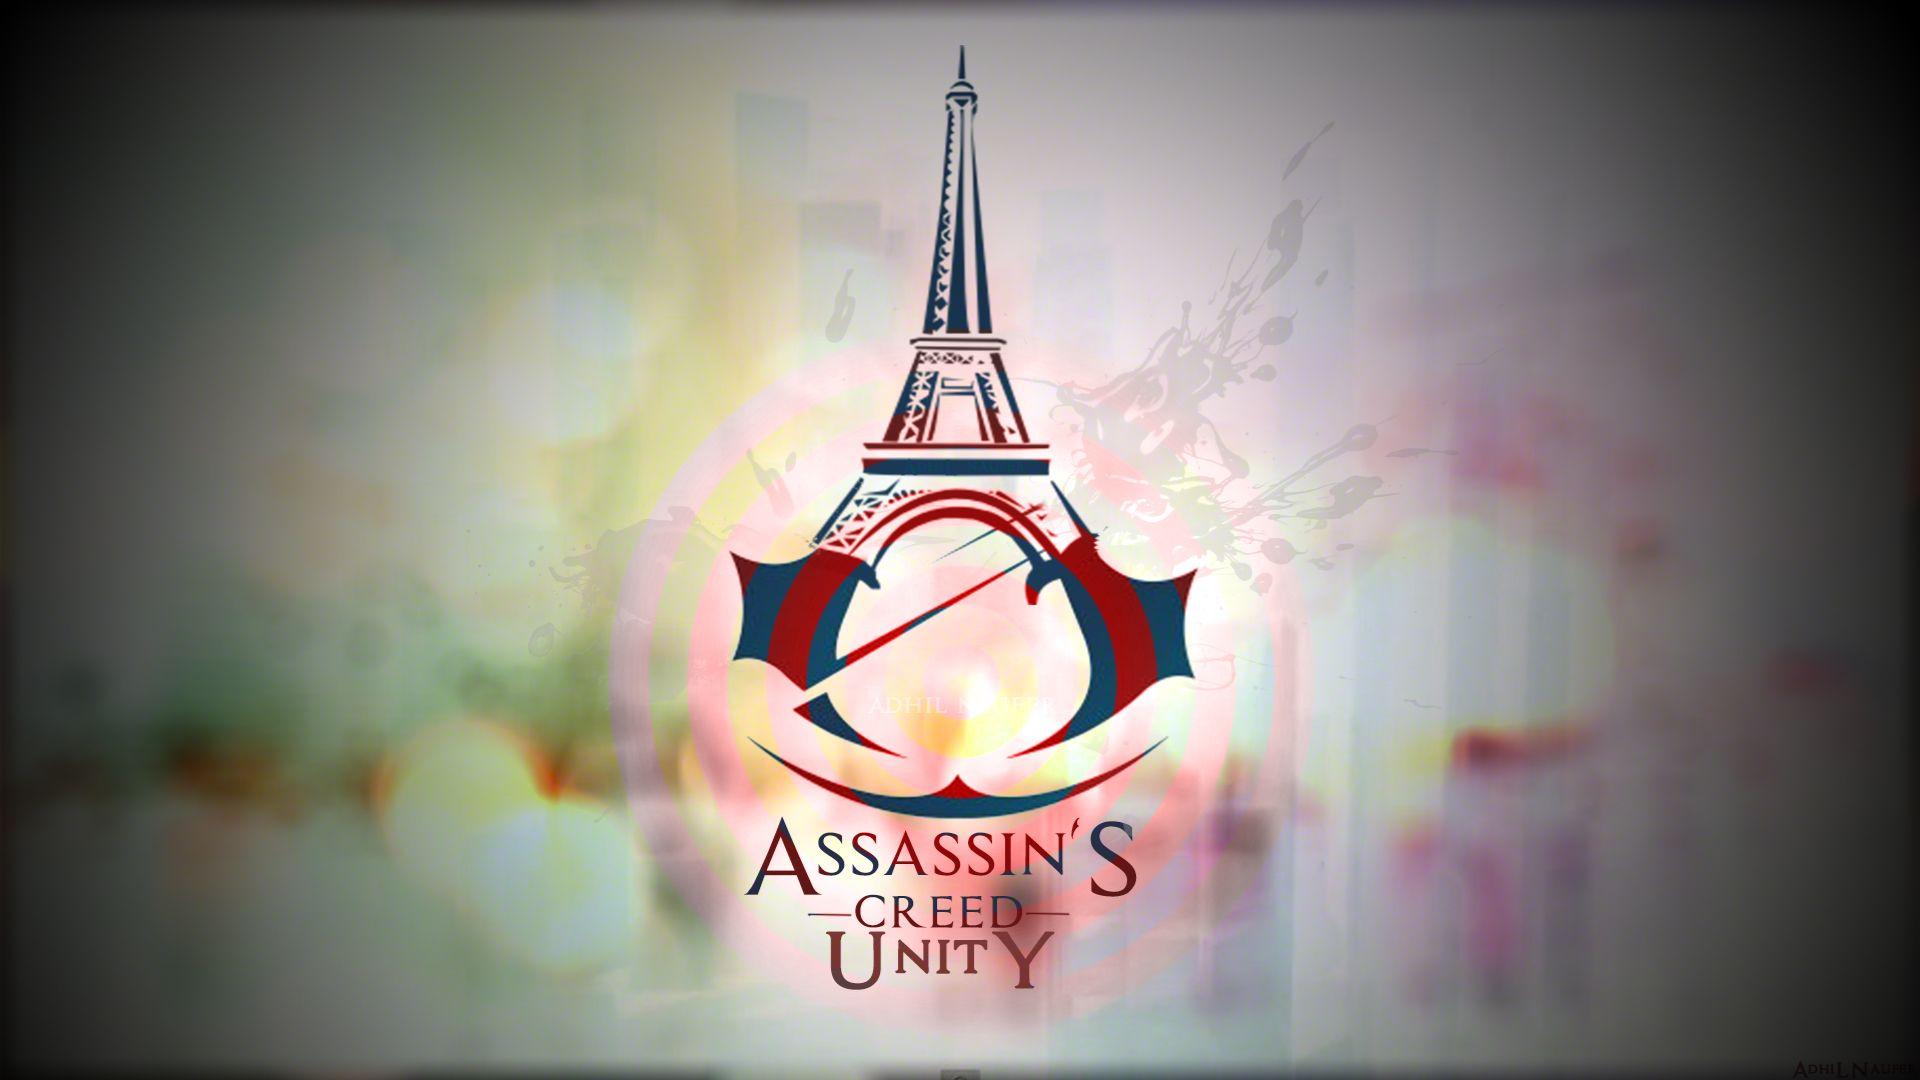 Assassin S Creed Unity Logo Hd Wallpaper